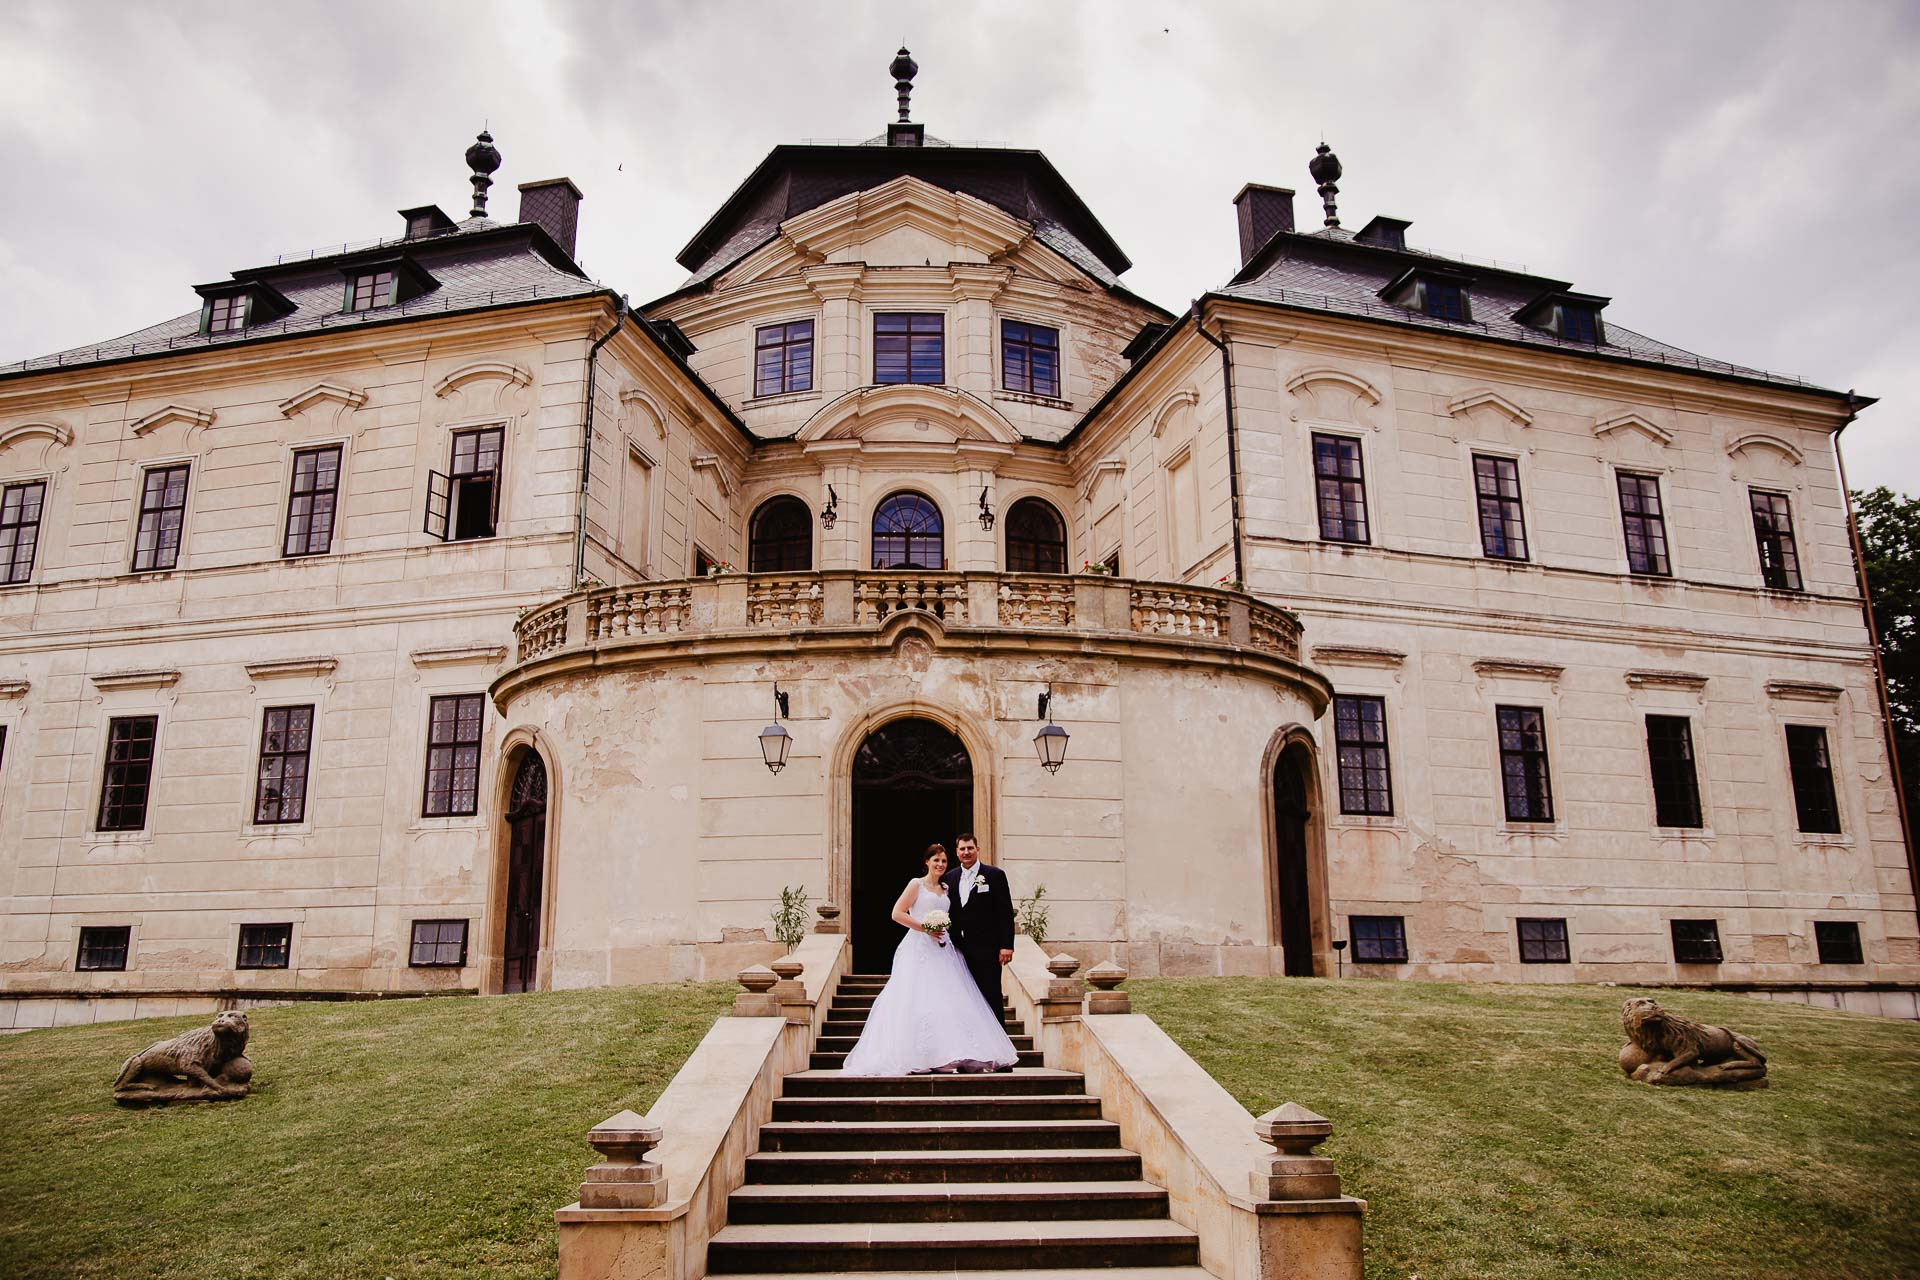 Svatební-fotograf-zámek-Karlova-Koruna-Chlumec-nad-Cidlinou-184